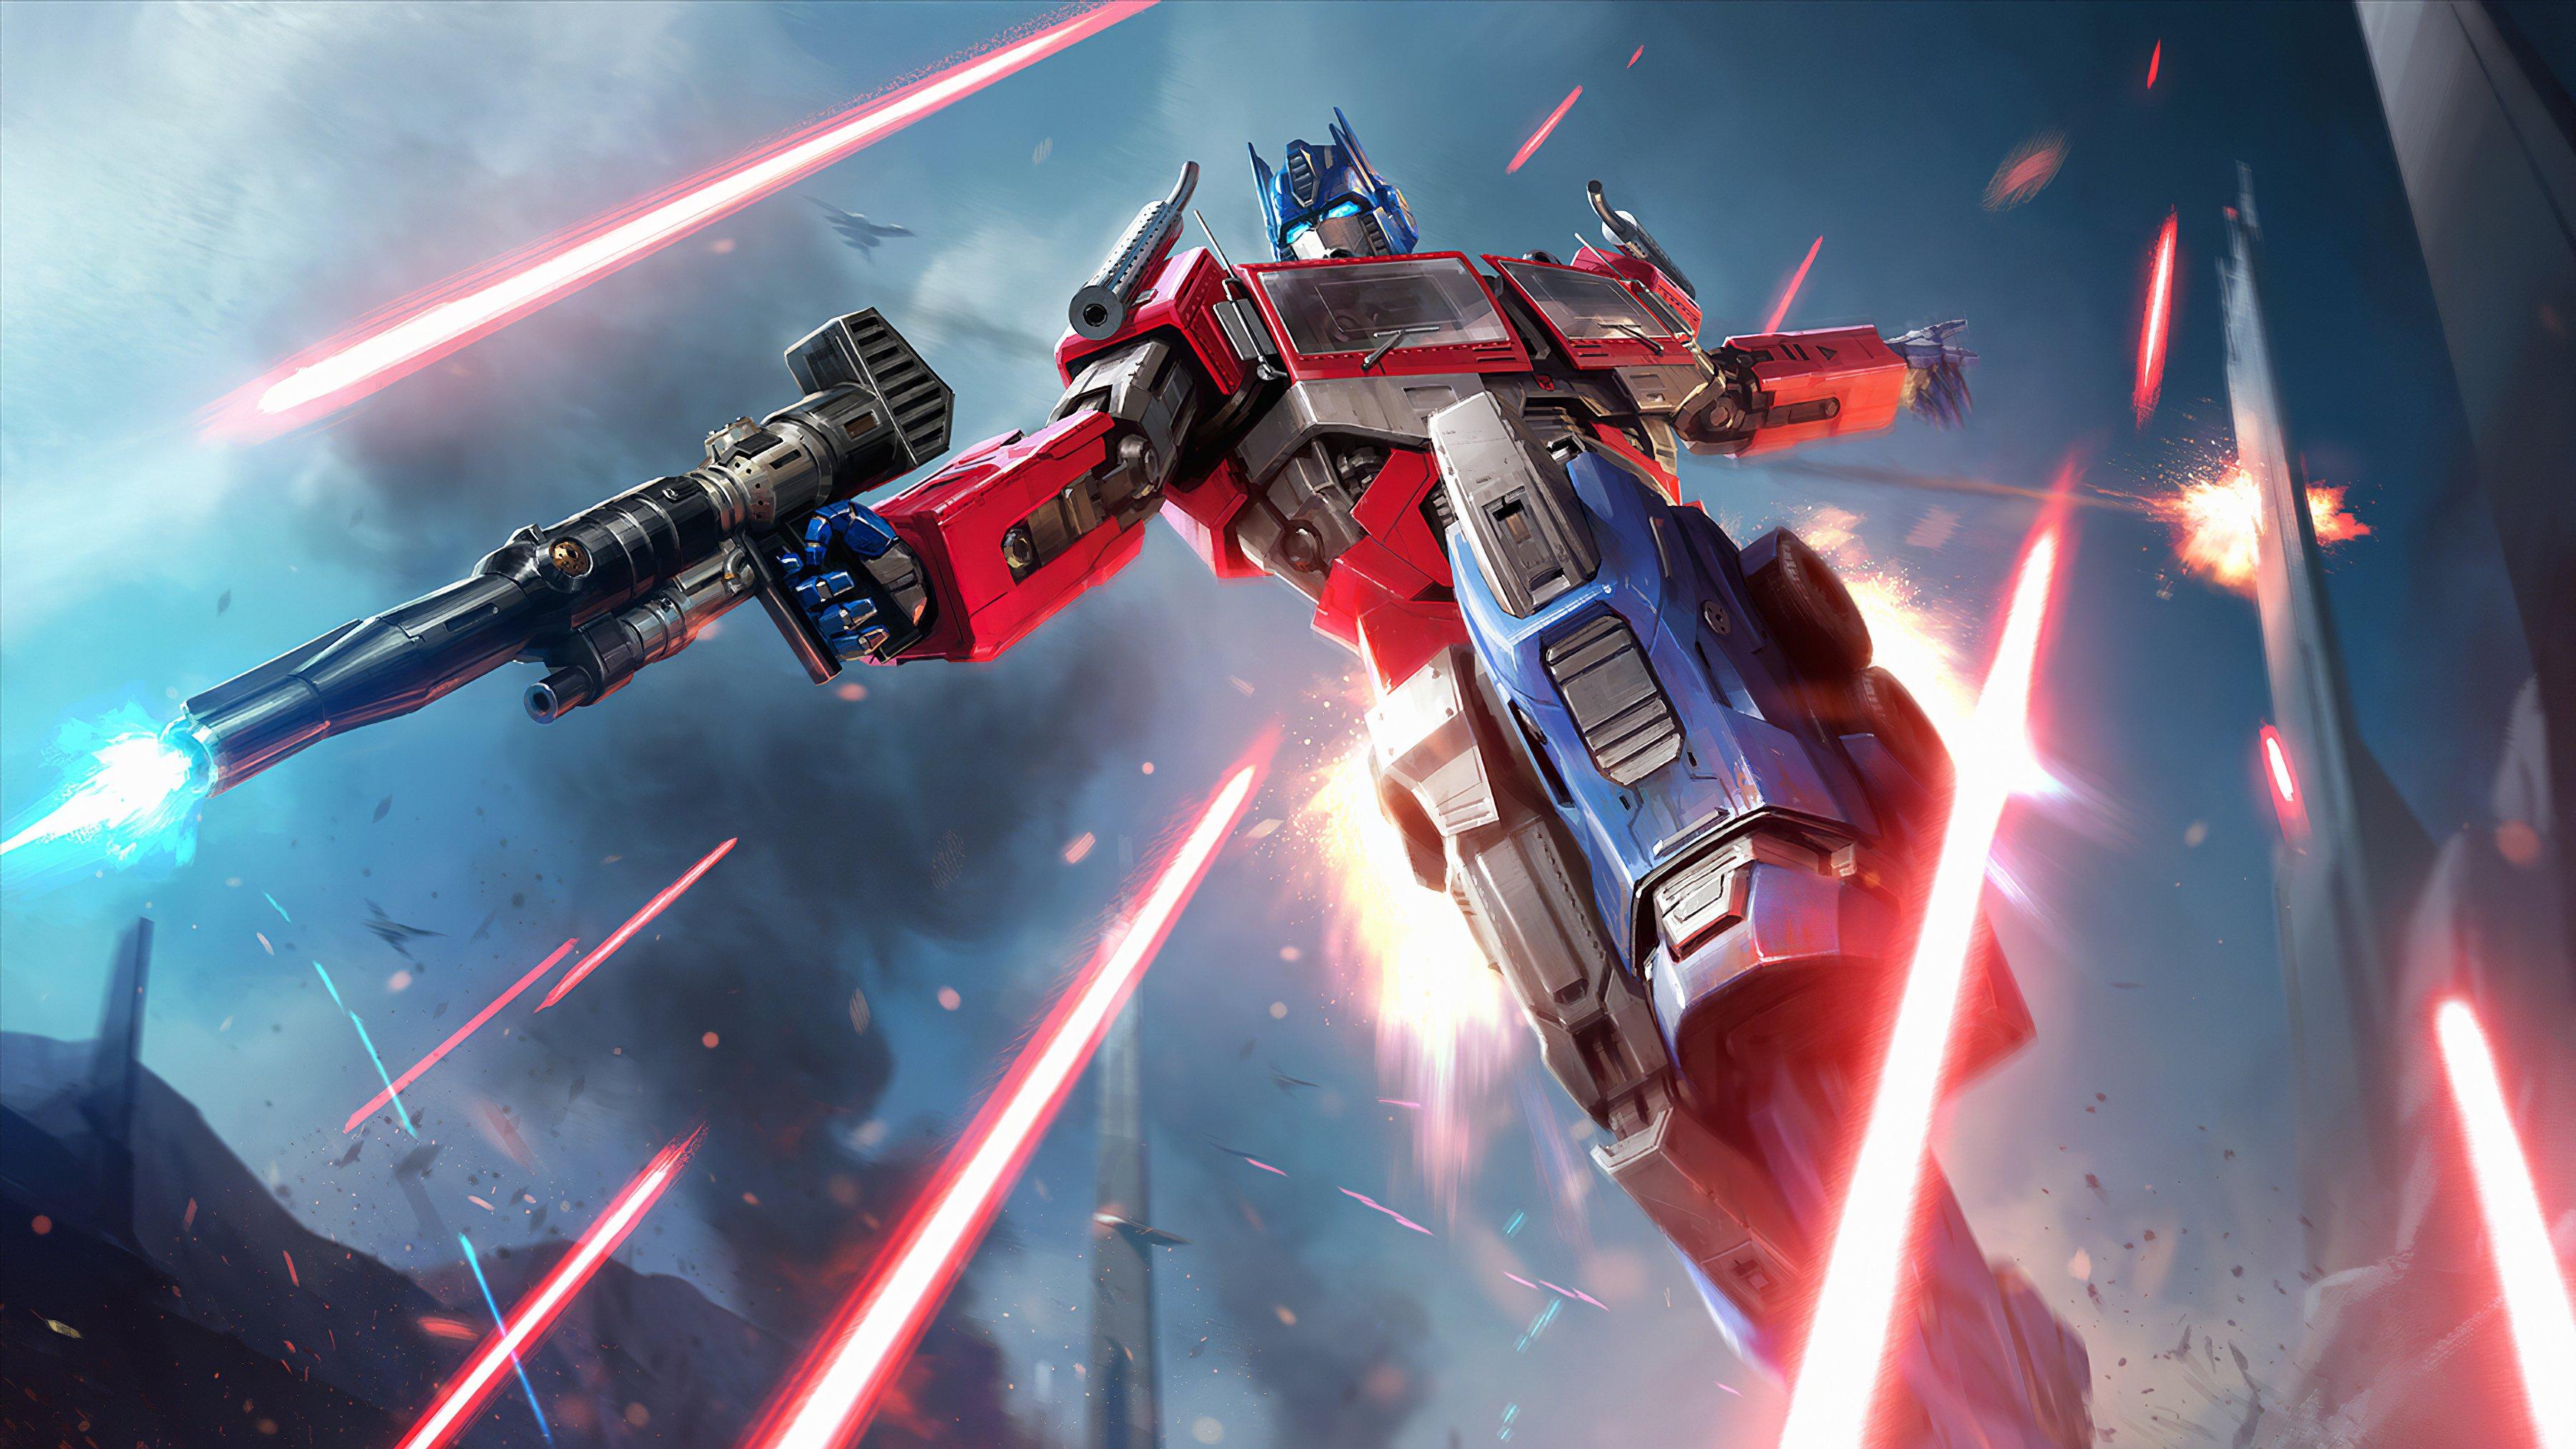 Fondos de pantalla Optimus Prime peleando